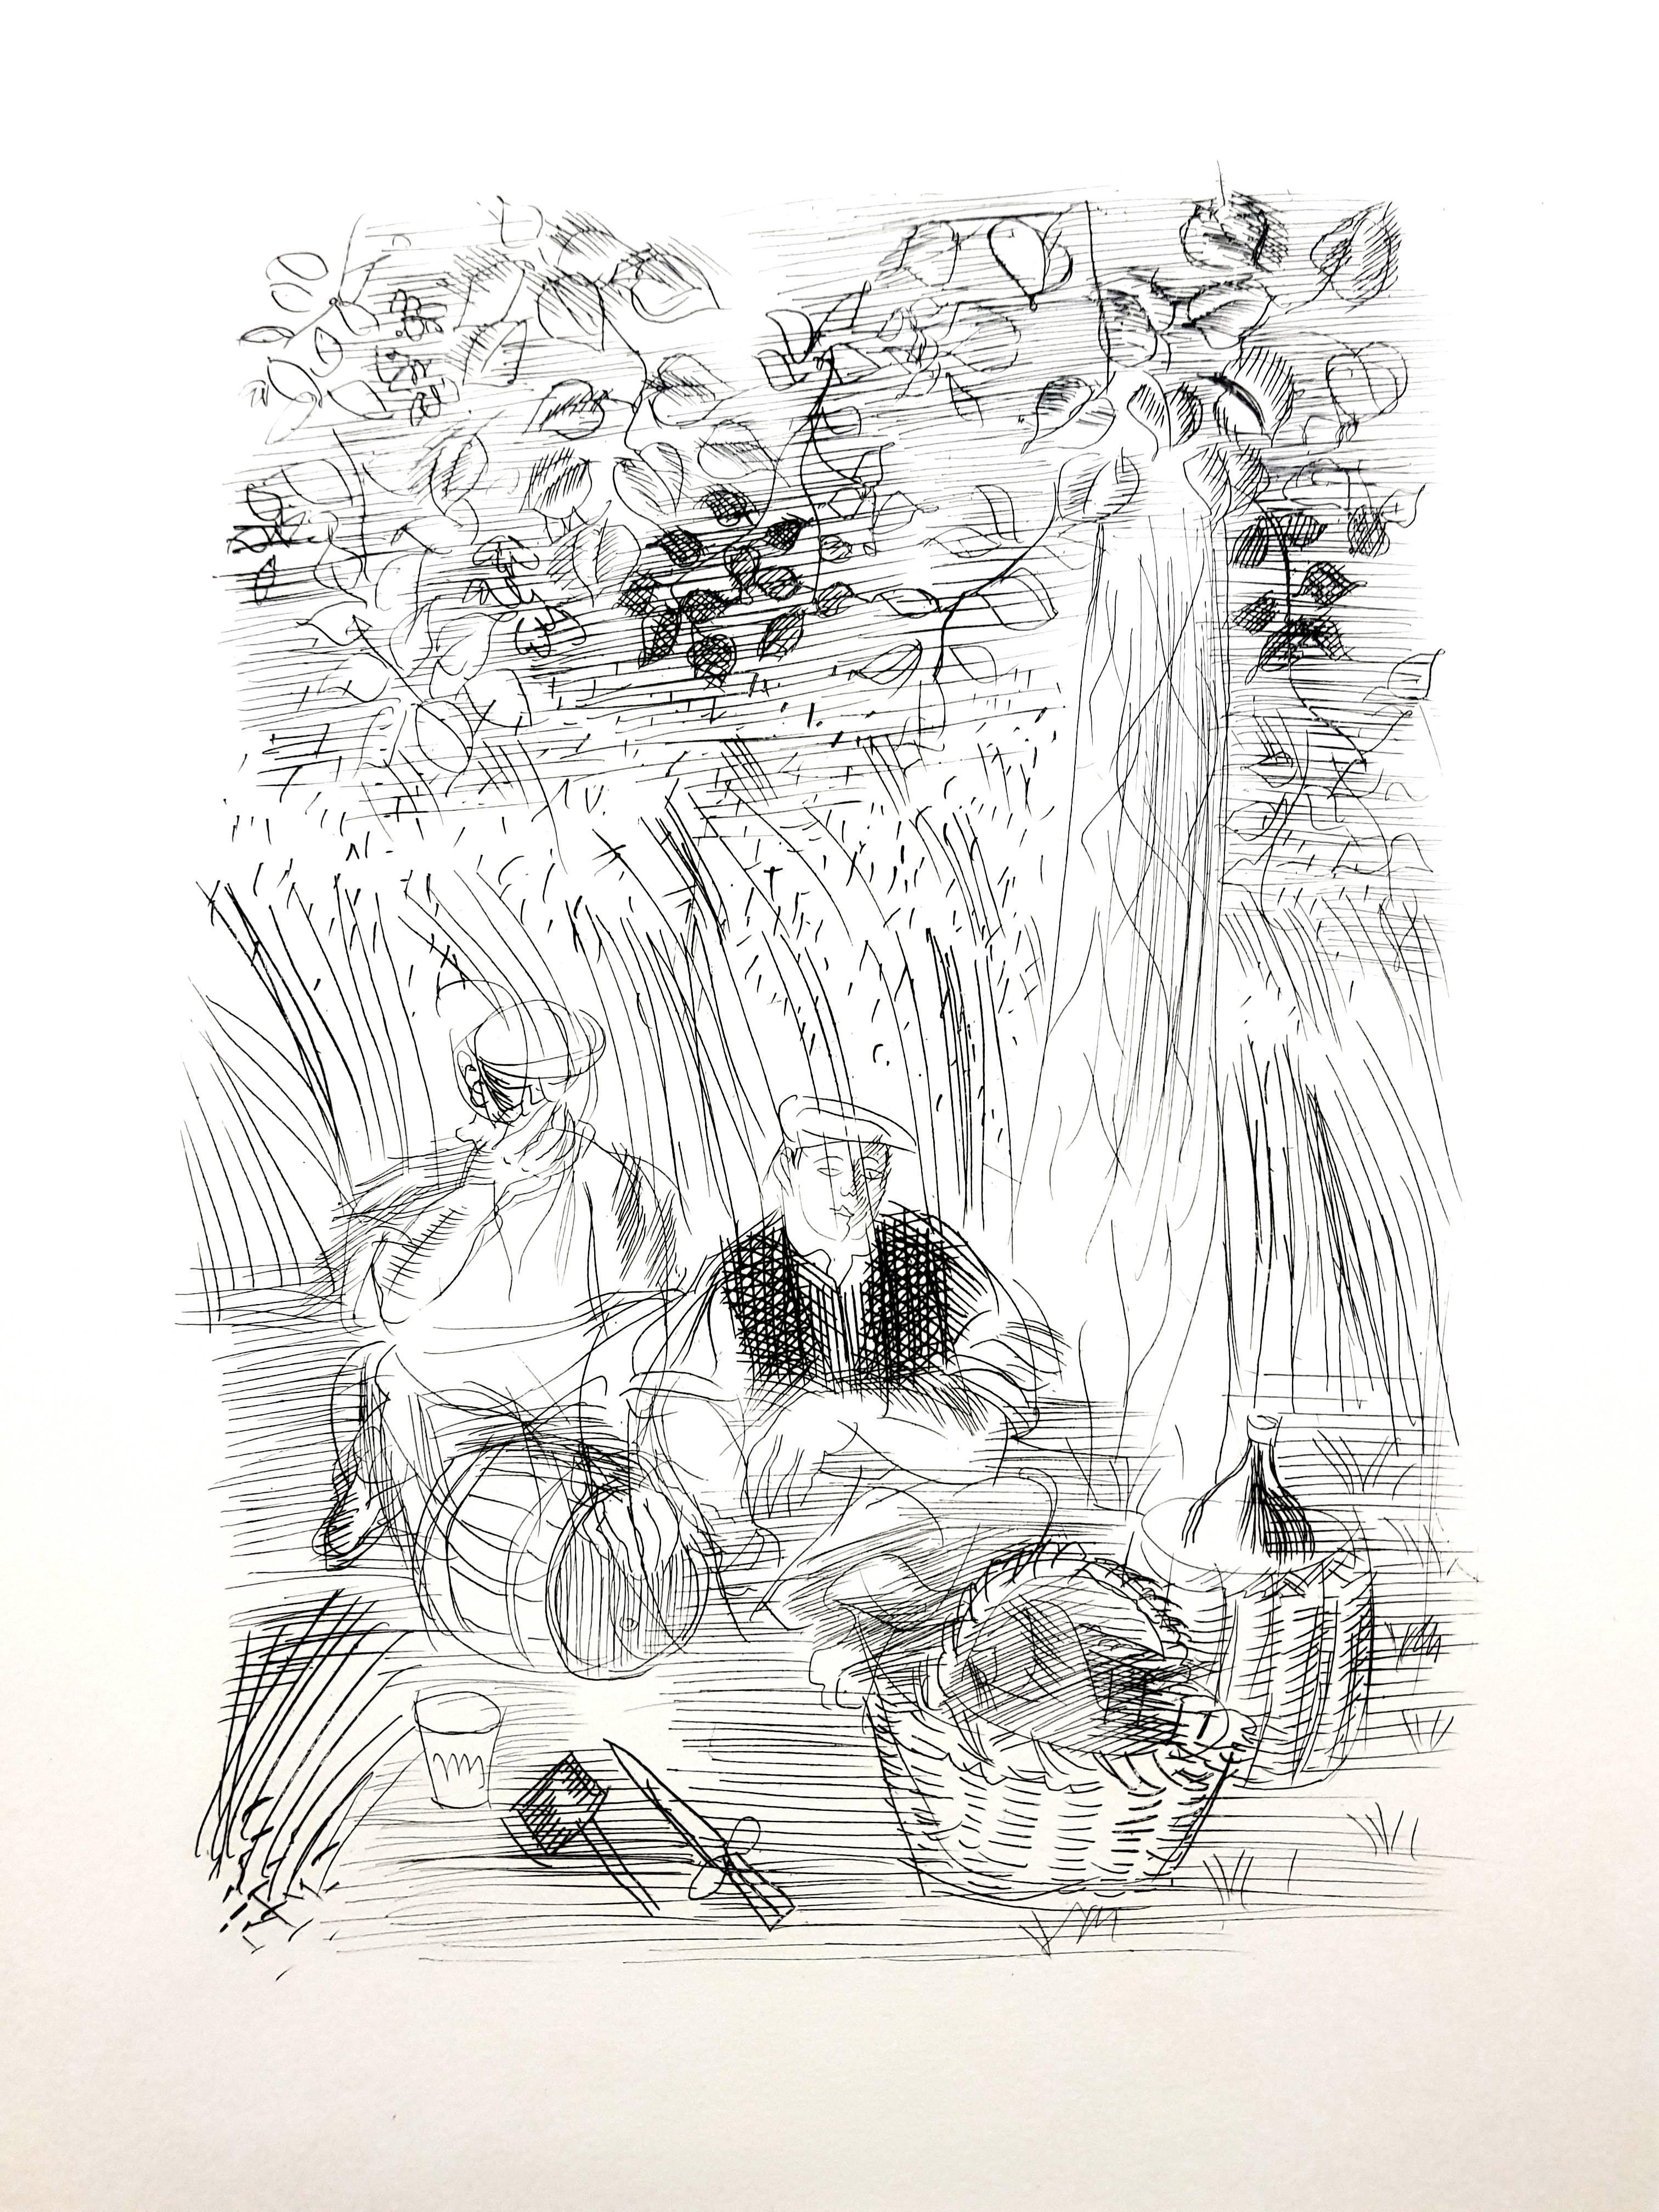 Raoul Dufy - Paysan - Original Etching